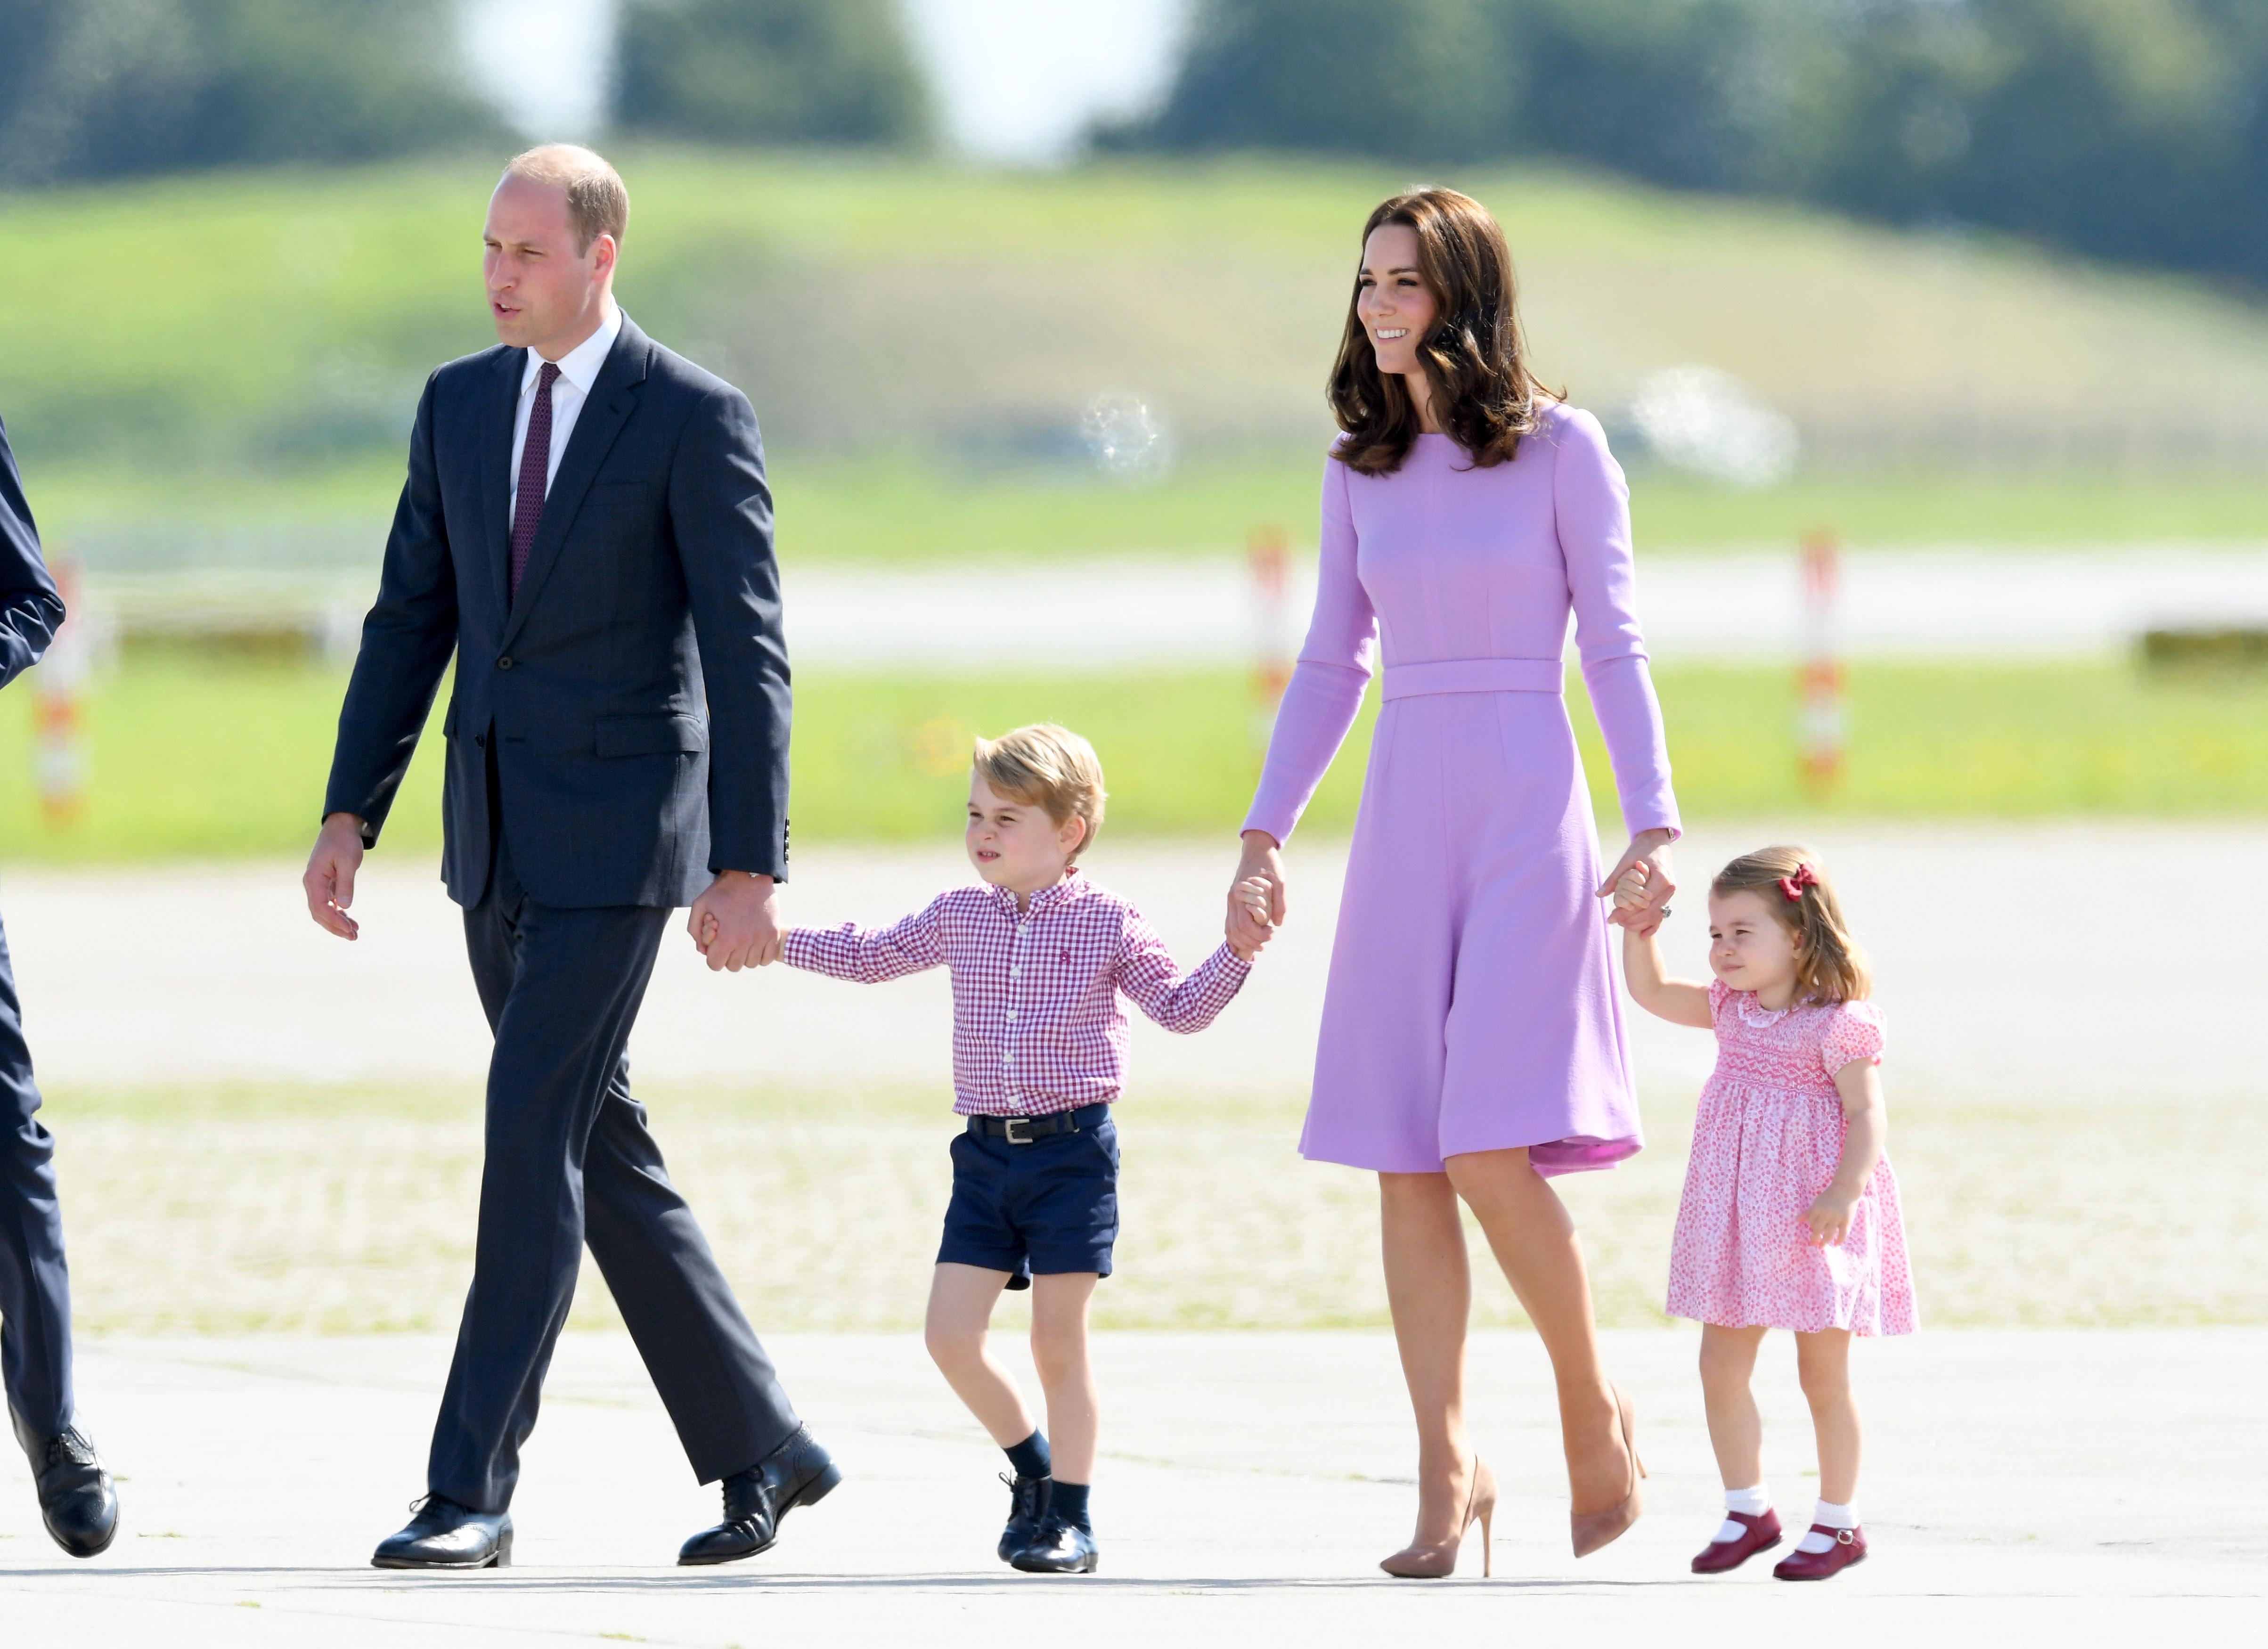 royal family walking